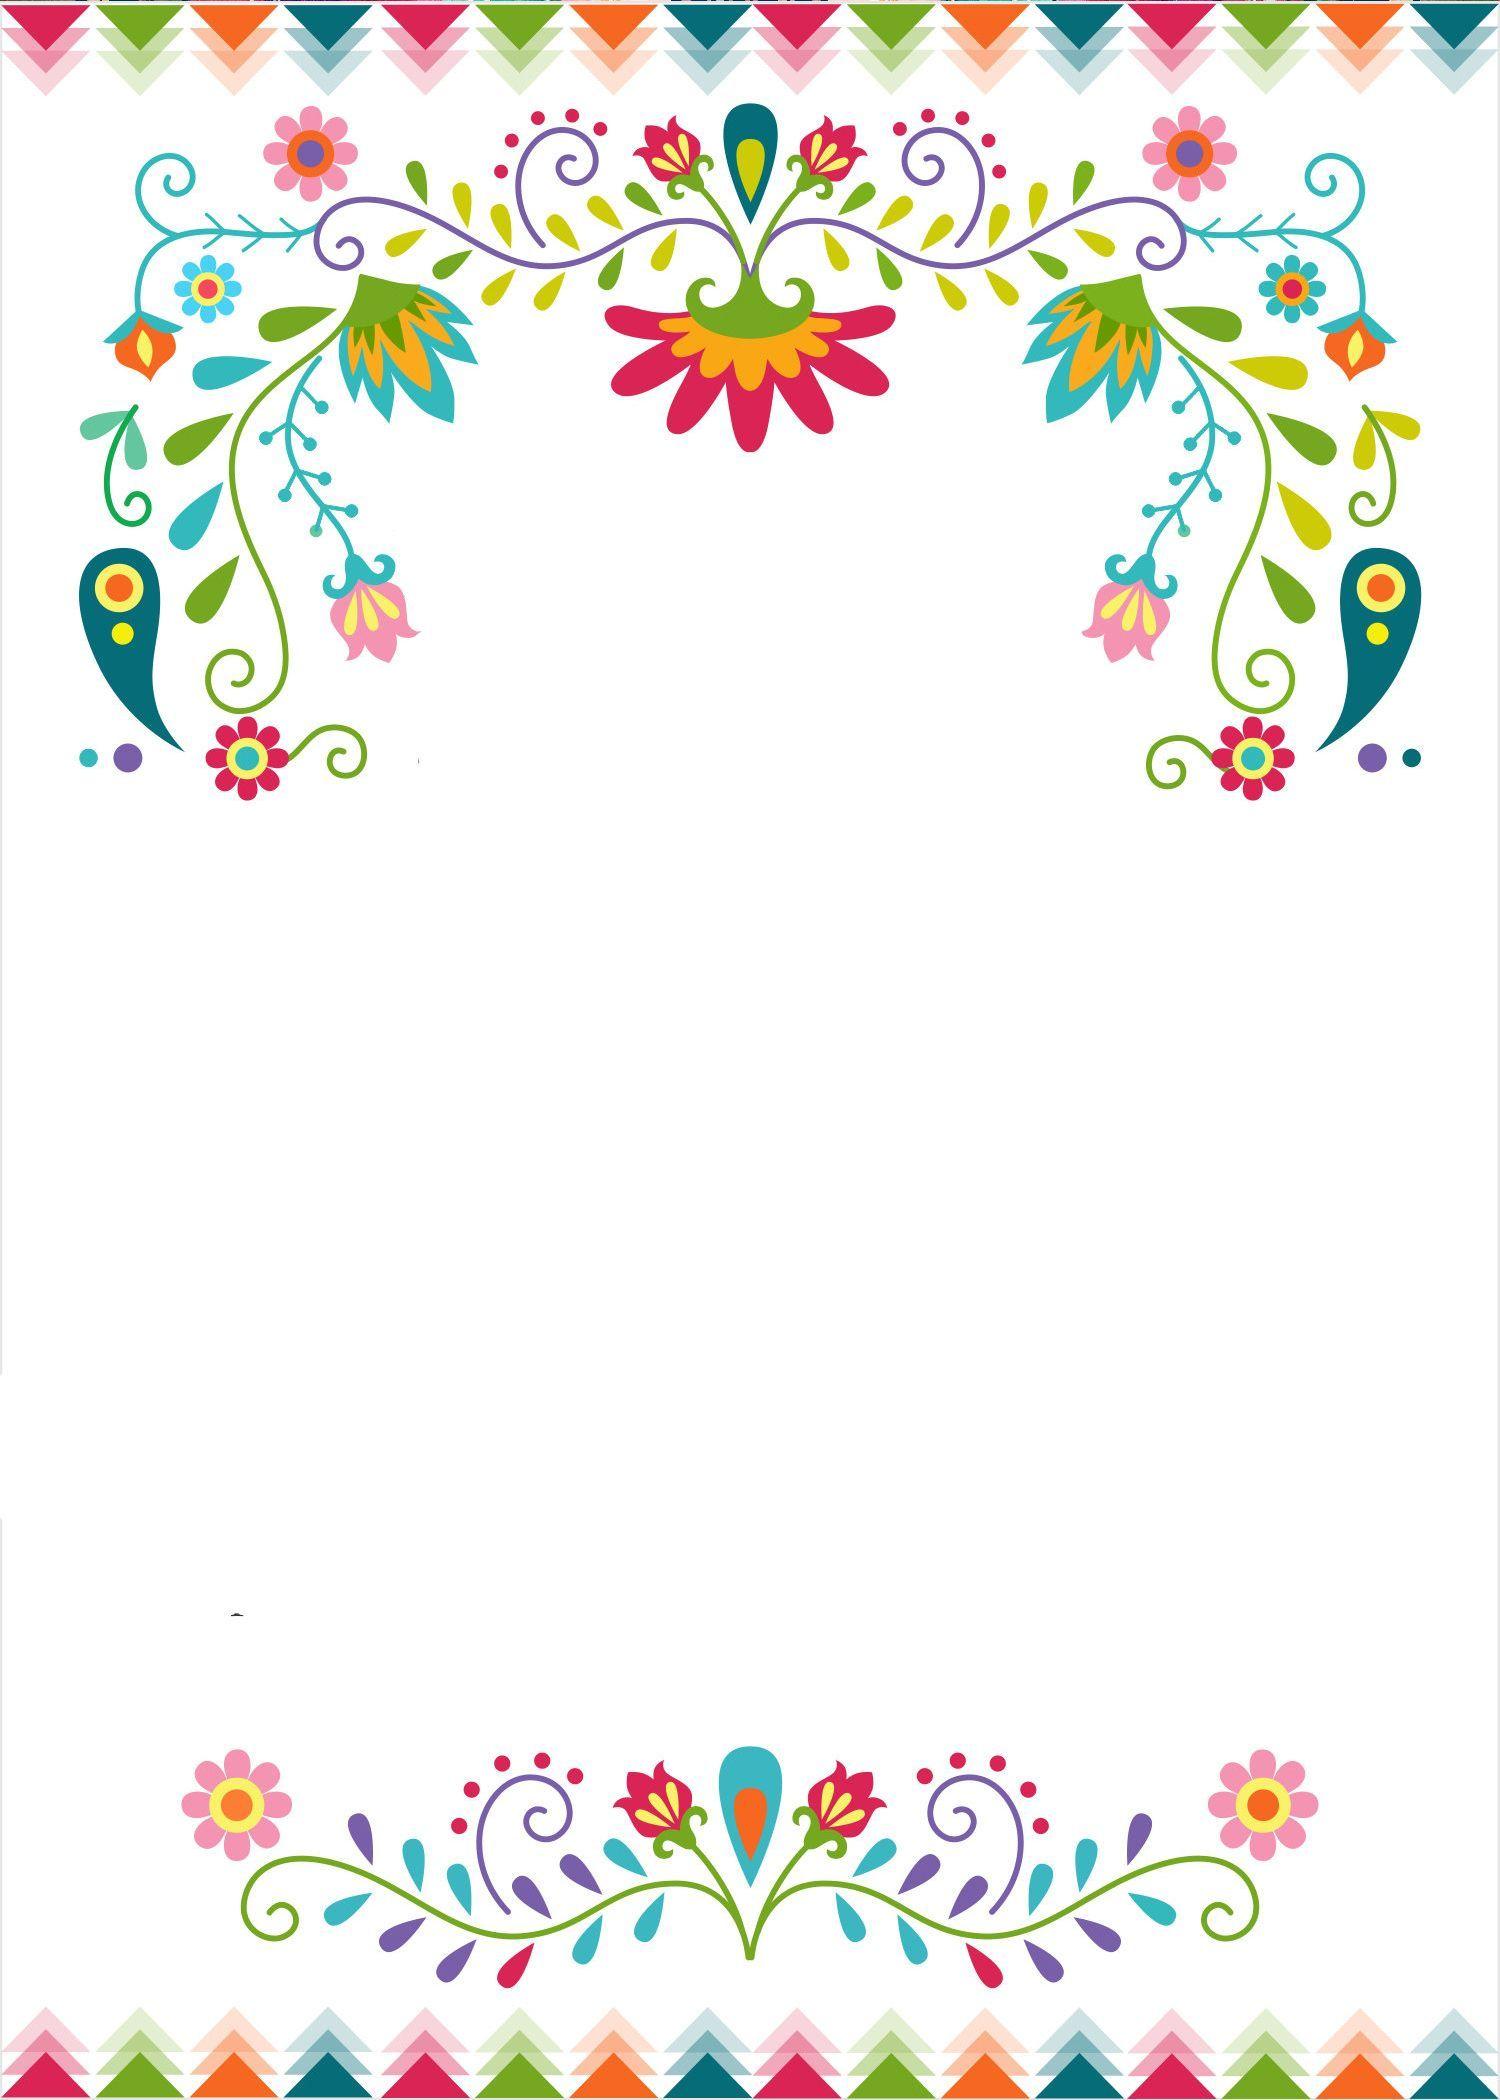 025 Fiesta Invitations Templates Free Editable Template Singular Ideas In 2020 Papel Picado Wedding Invitation Christmas Party Invitation Template Mexican Invitations